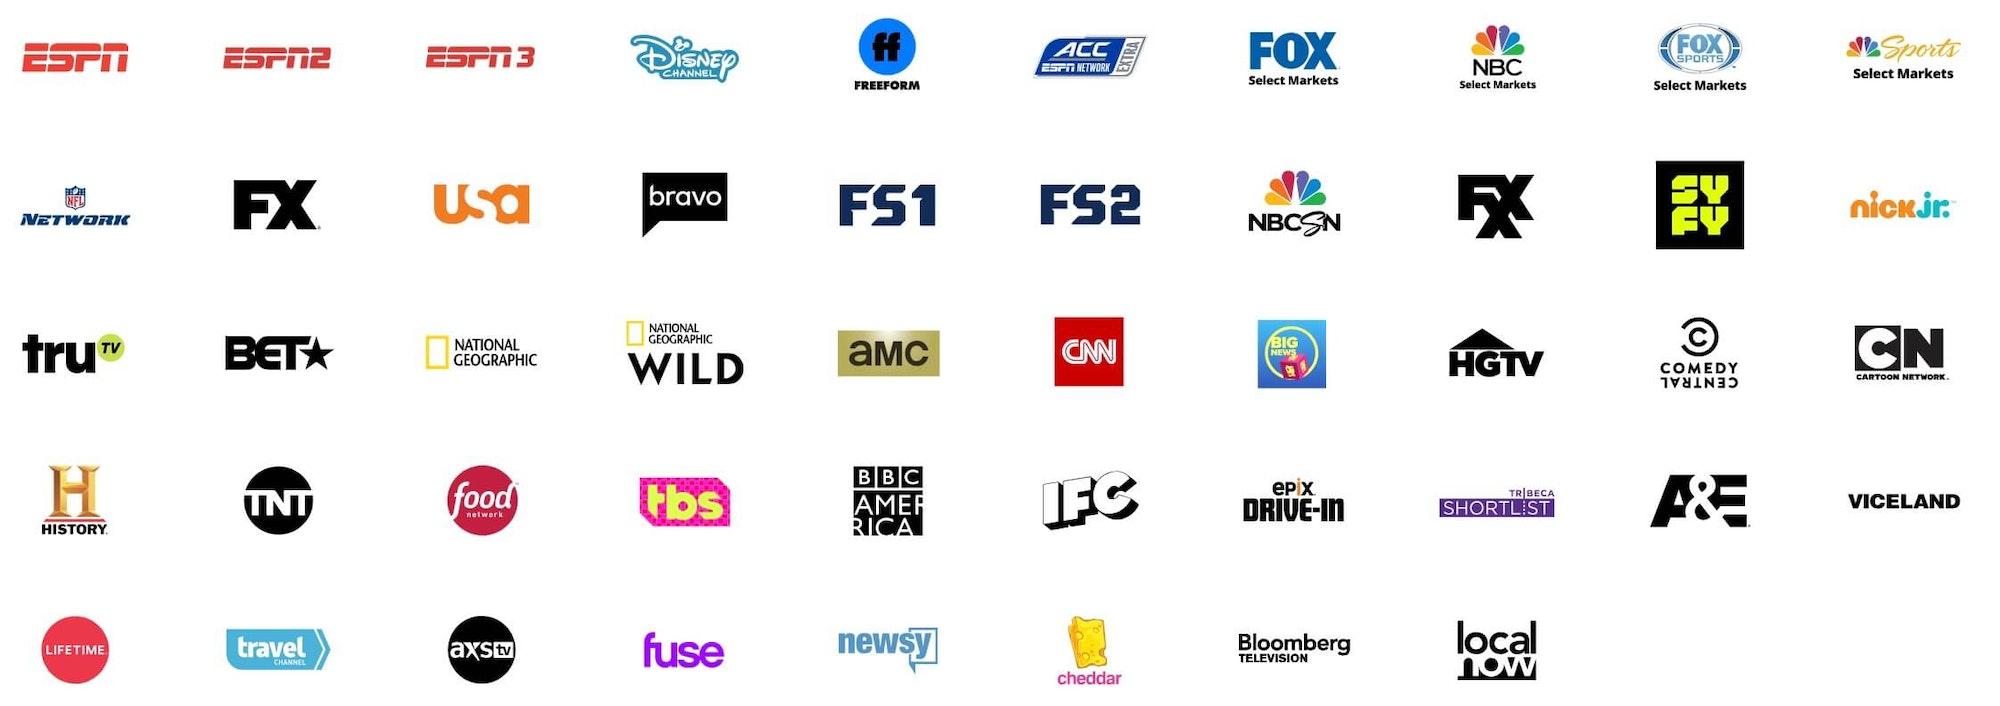 cowboys eagles sling tv streaming nfl nfc